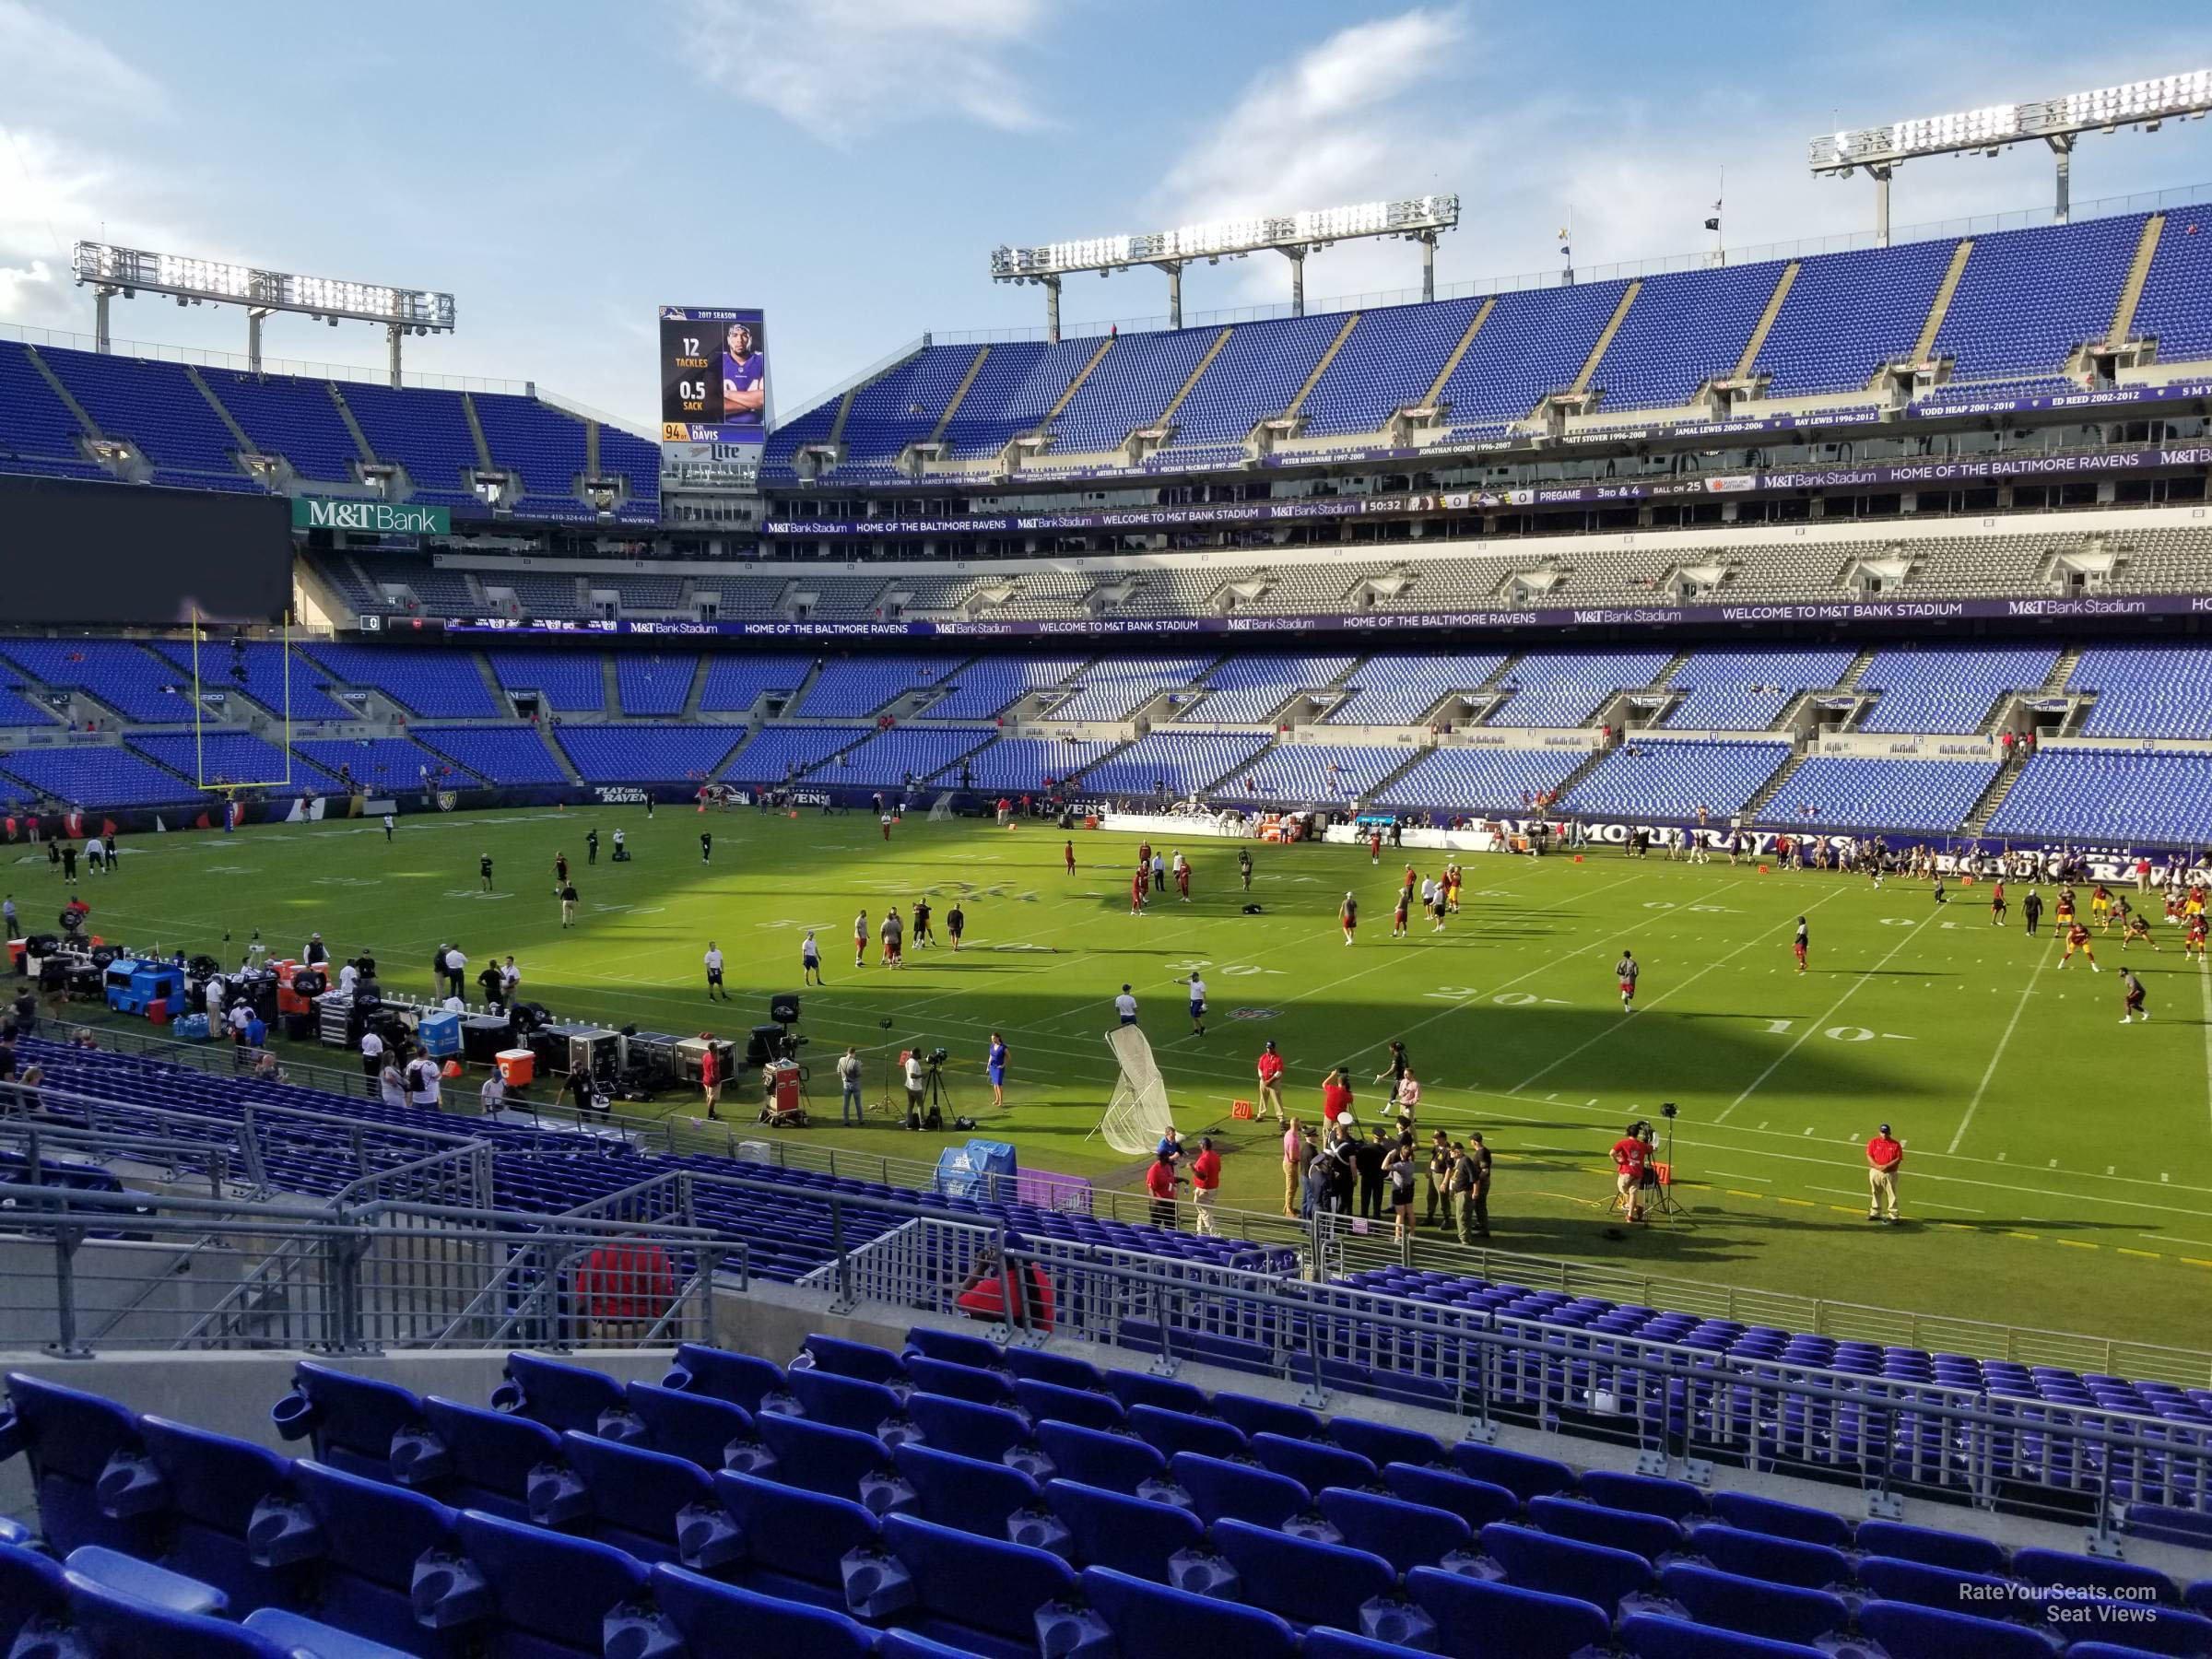 M Amp T Bank Stadium Section 123 Baltimore Ravens Rateyourseats Com